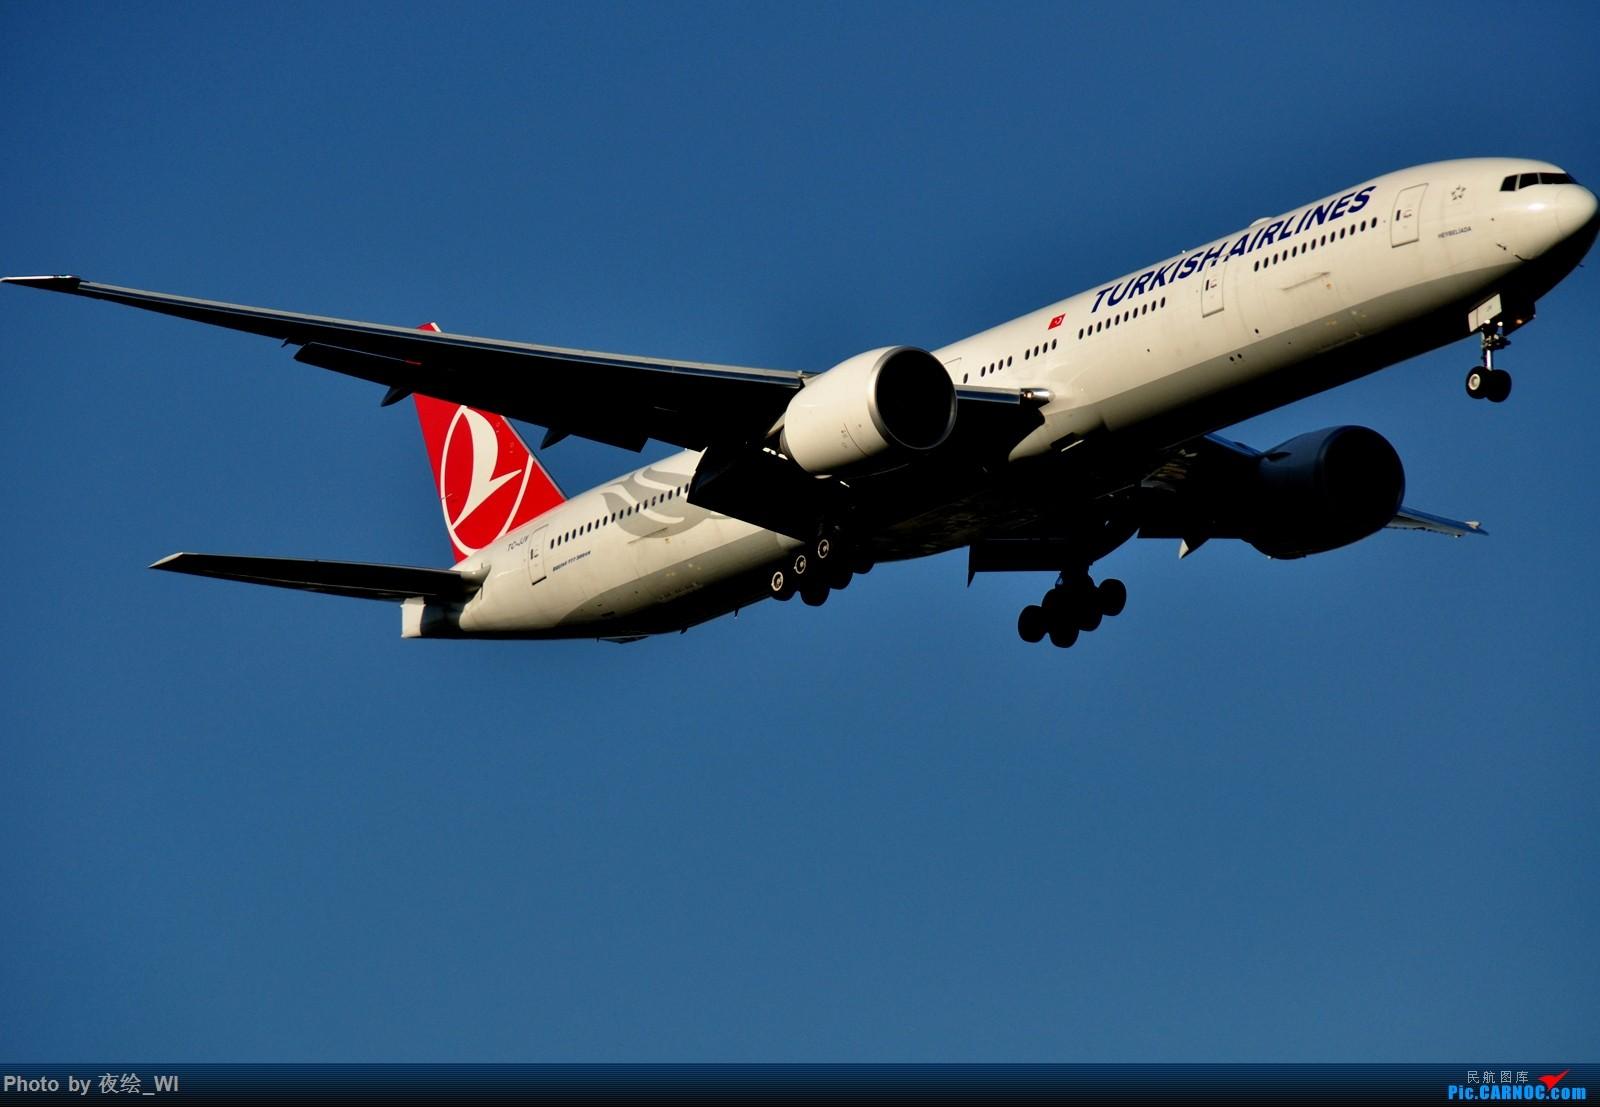 Re:[原创]【PVG】不只守着NKG,国庆疯狂拍机之浦东行,天空美得简直不像话! BOEING 777-300ER TC-JJV 中国上海浦东国际机场